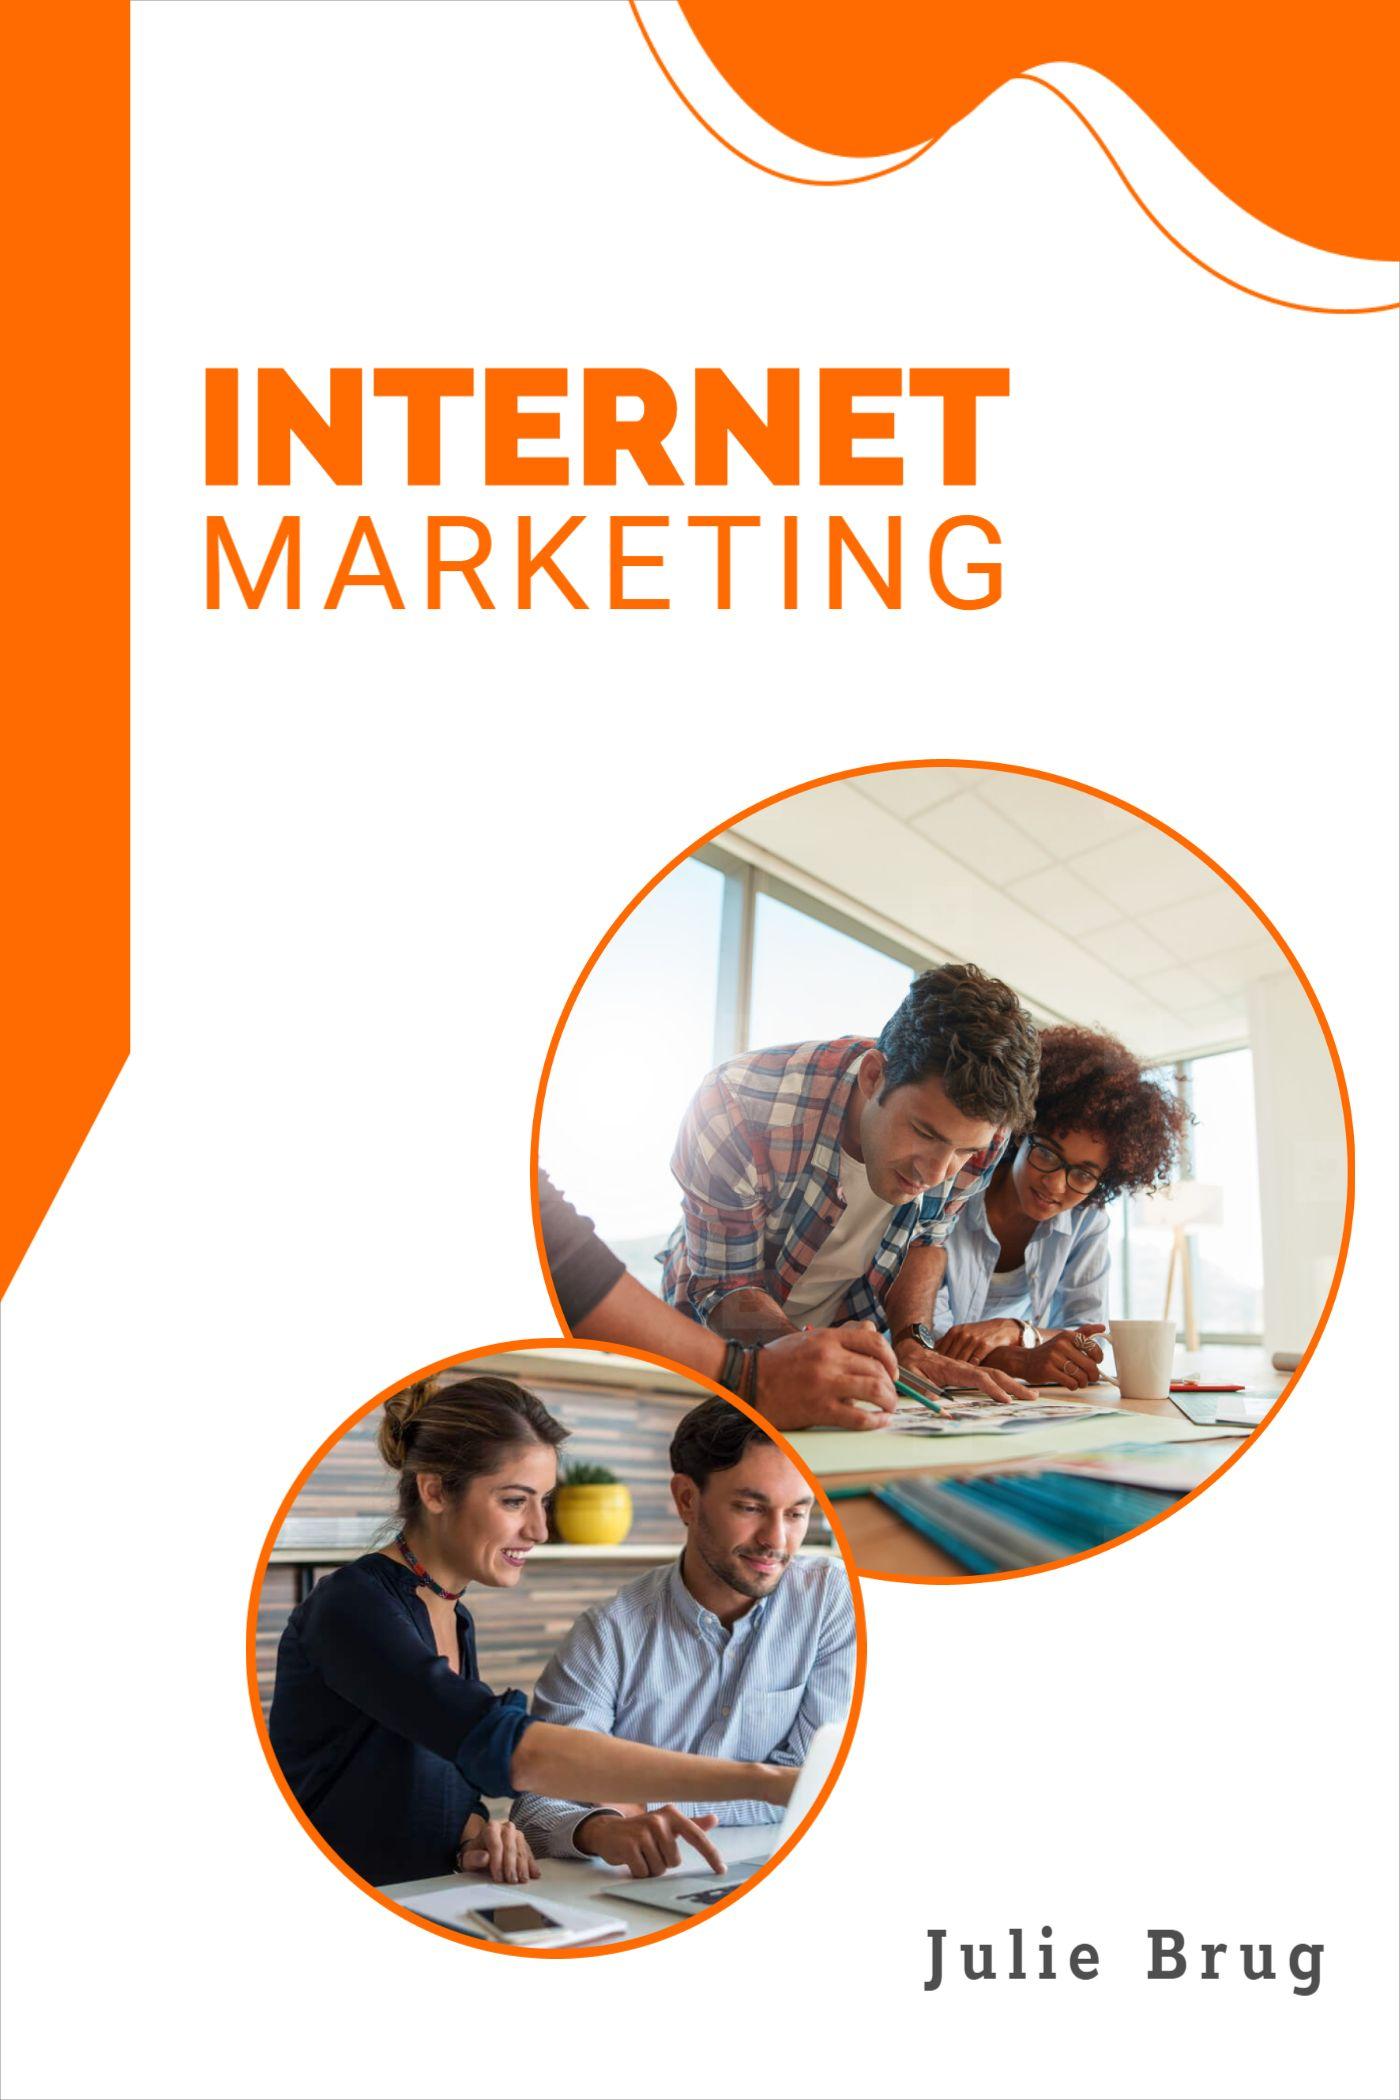 Internet Marketing Book Cover